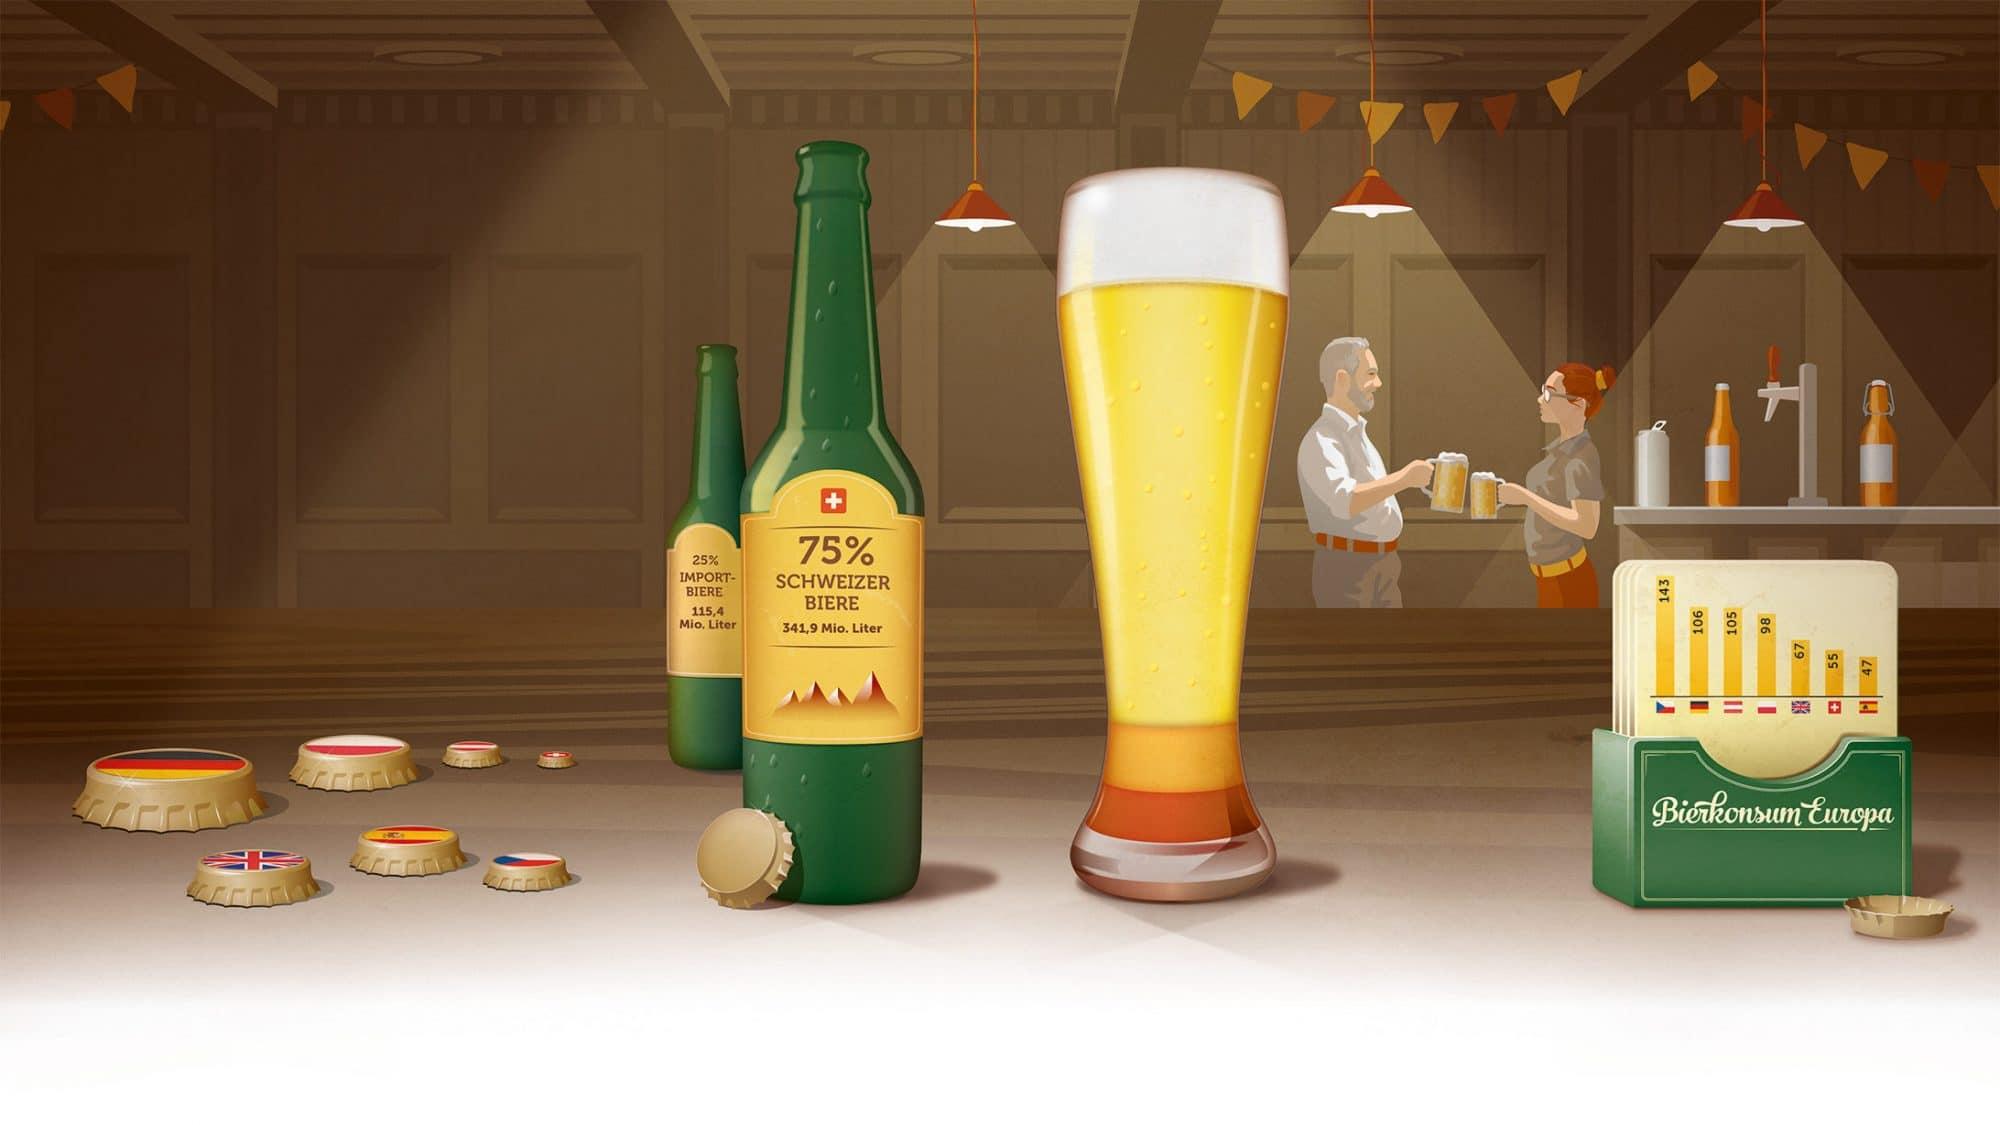 Illustration mit Bier